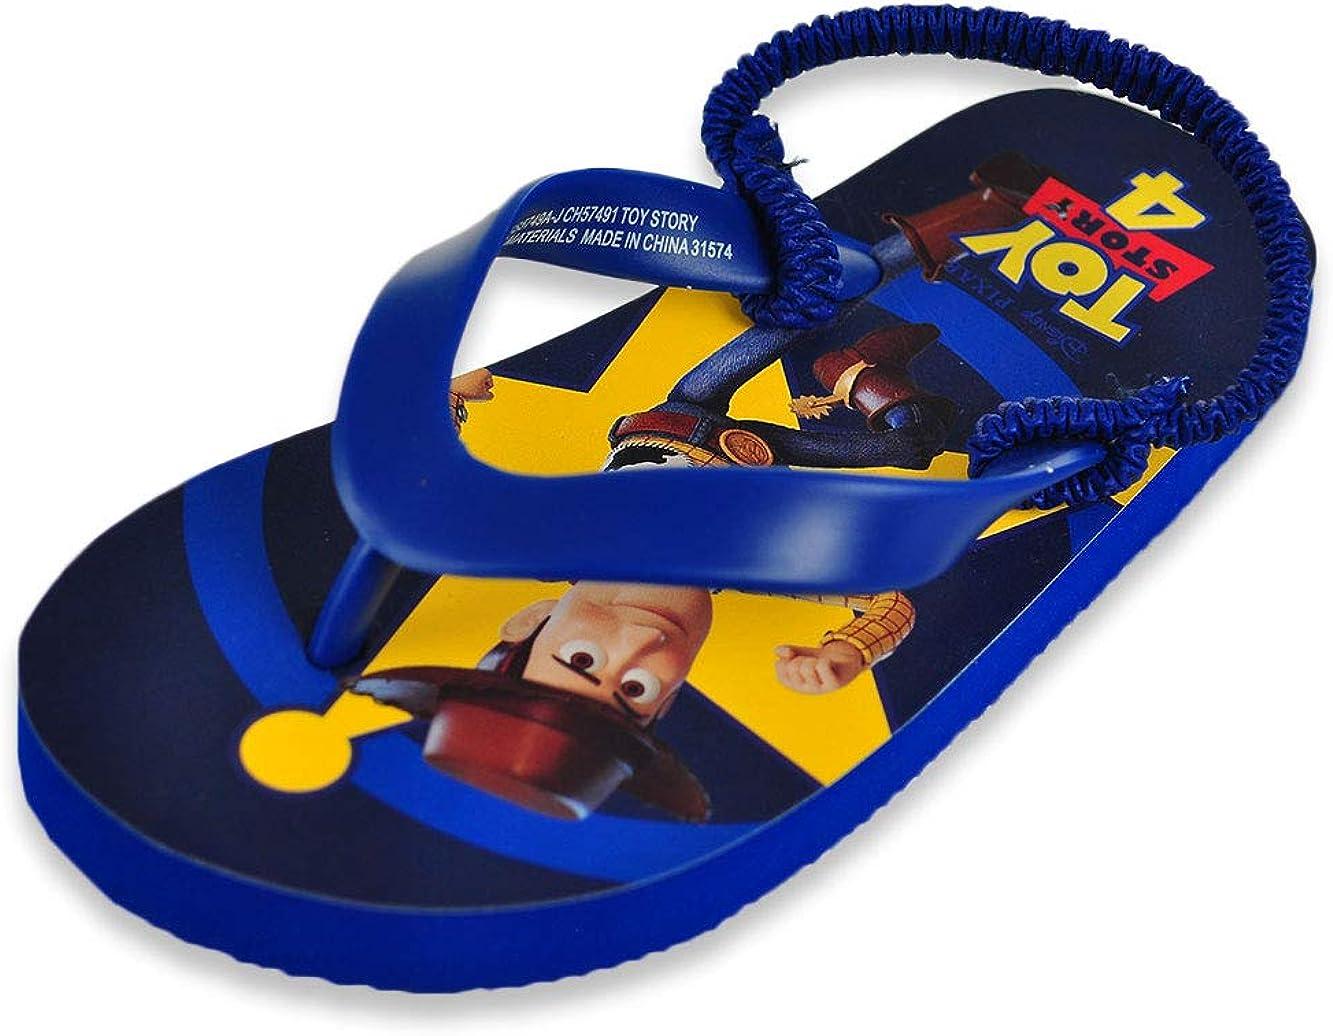 Disney Pixar Boy's Toy Story Sandals - Thong Flip Flops with Elastic Heel